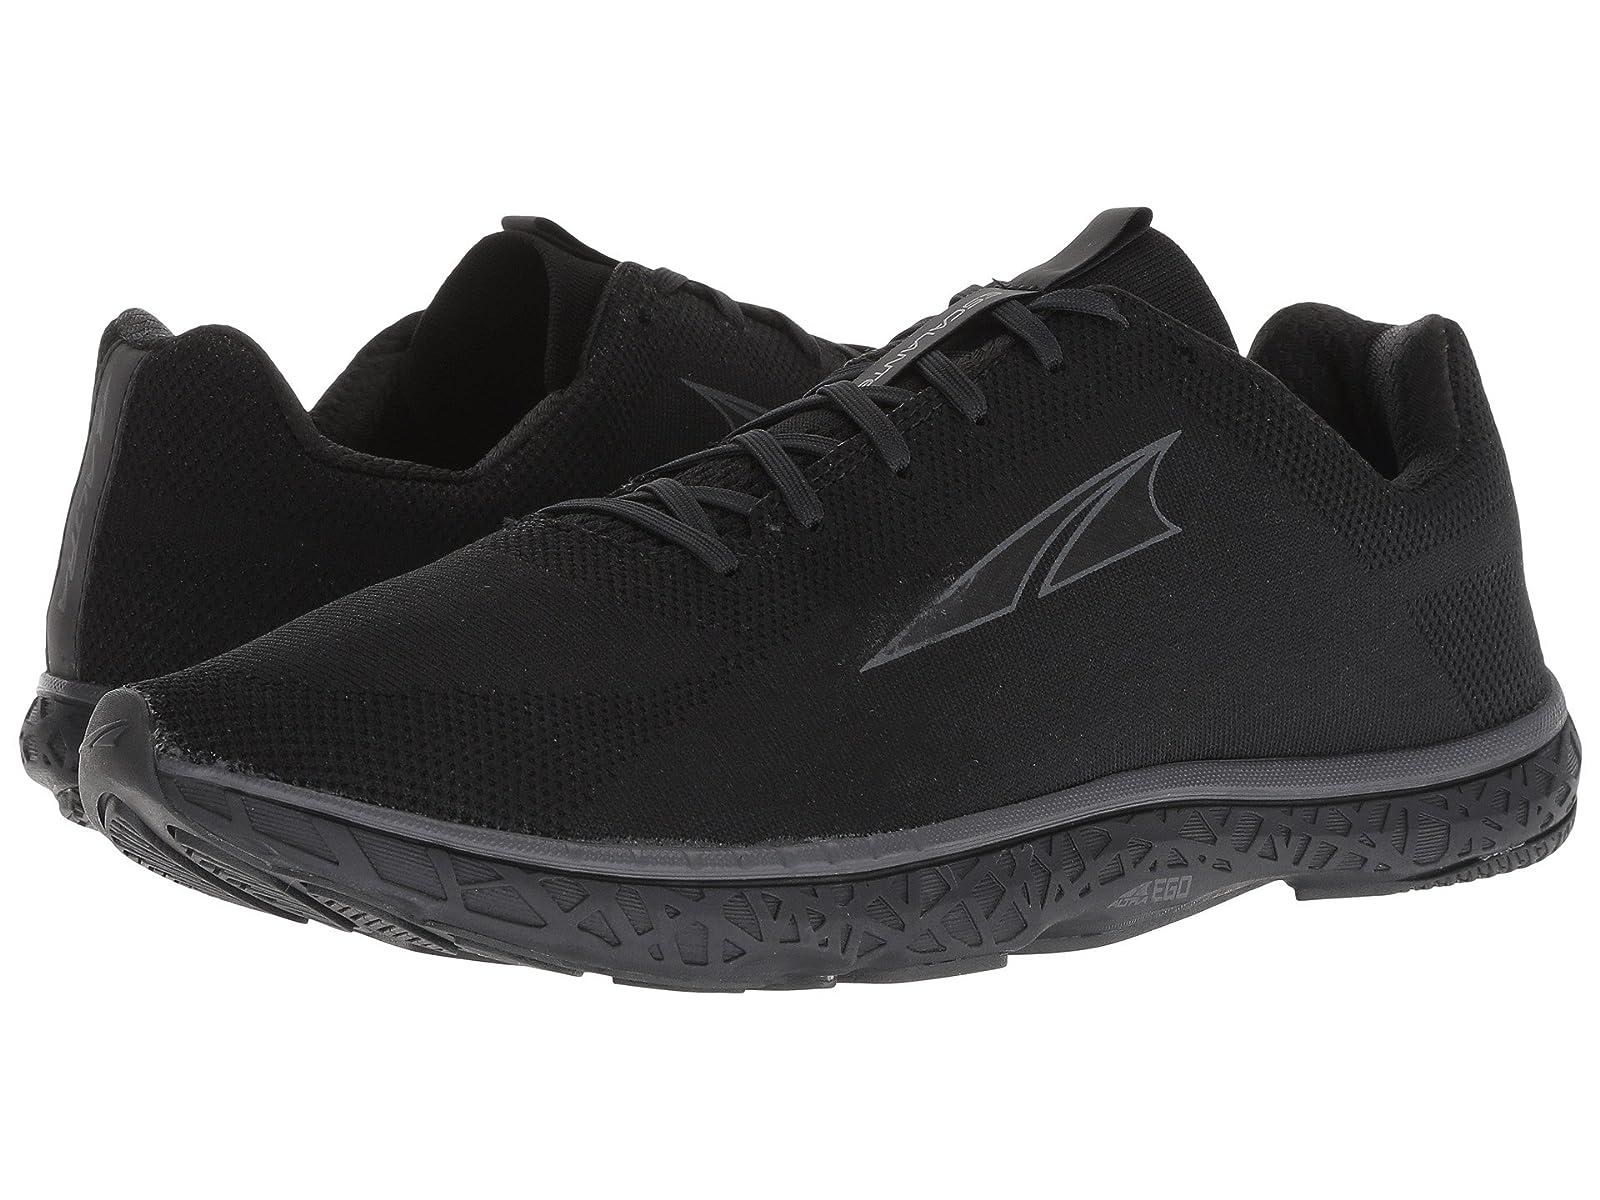 Altra Footwear Escalante 1.5Atmospheric grades have affordable shoes